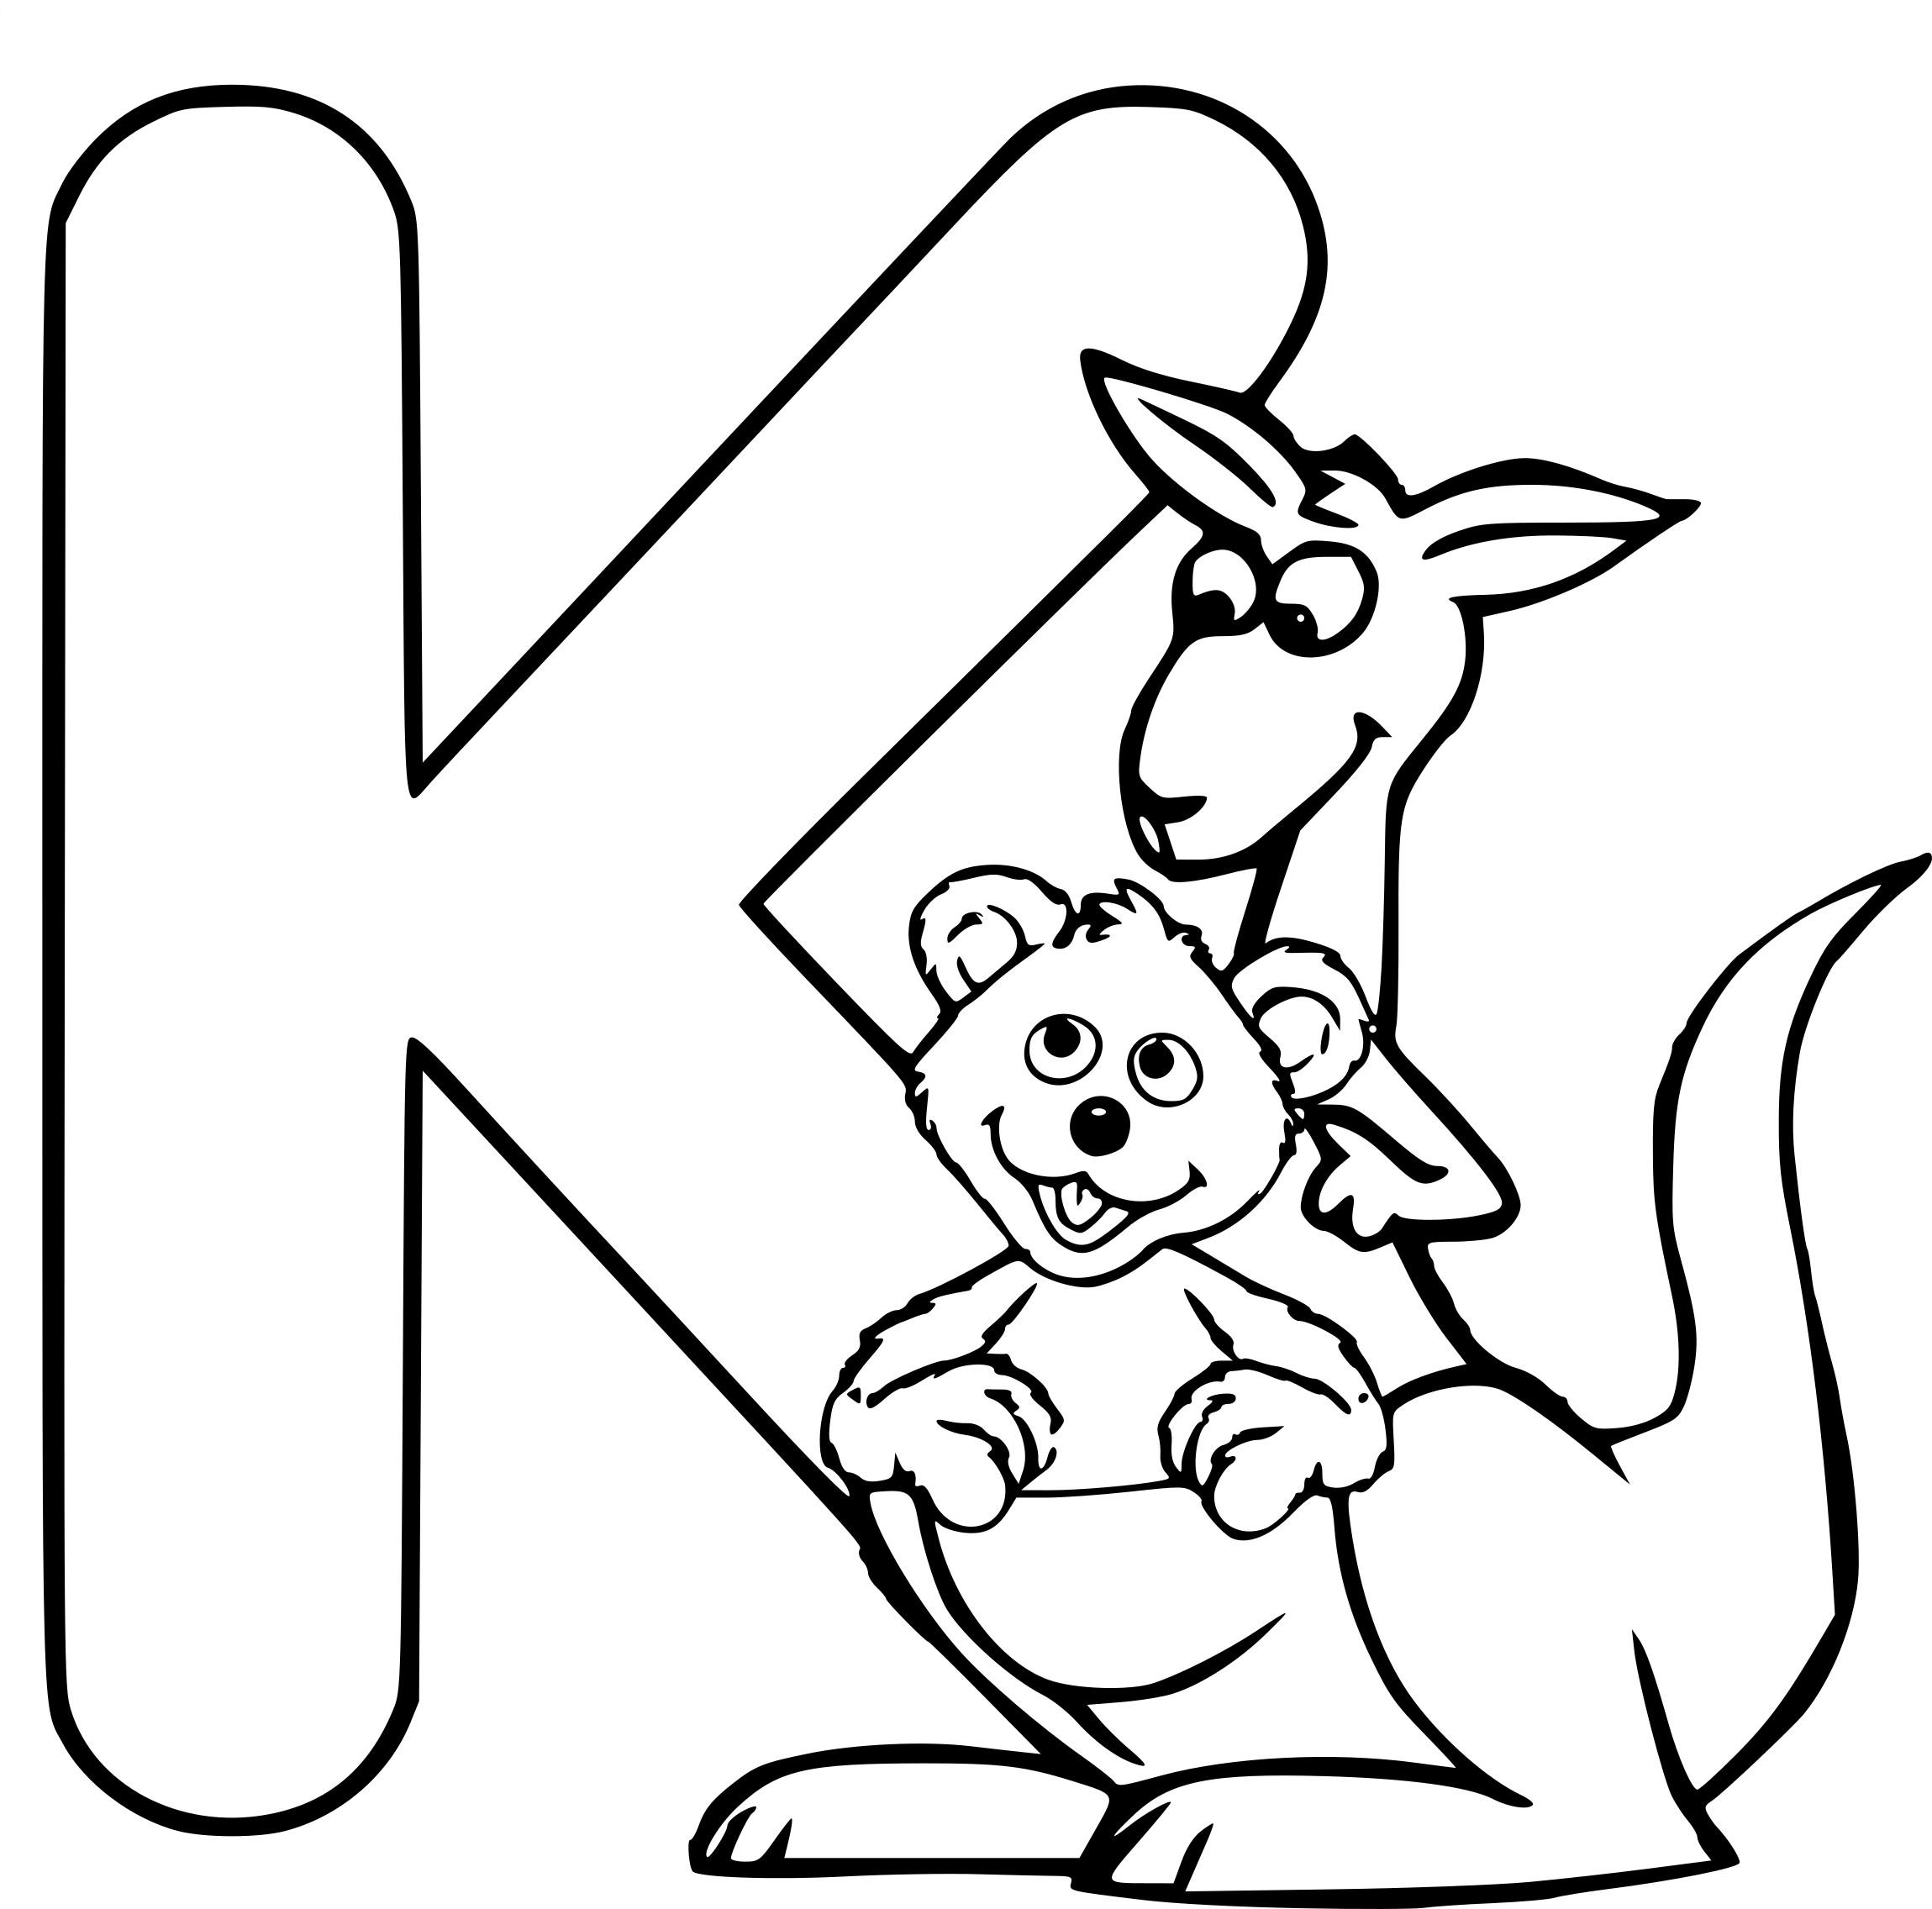 Coloriage K me kangourou imprimer